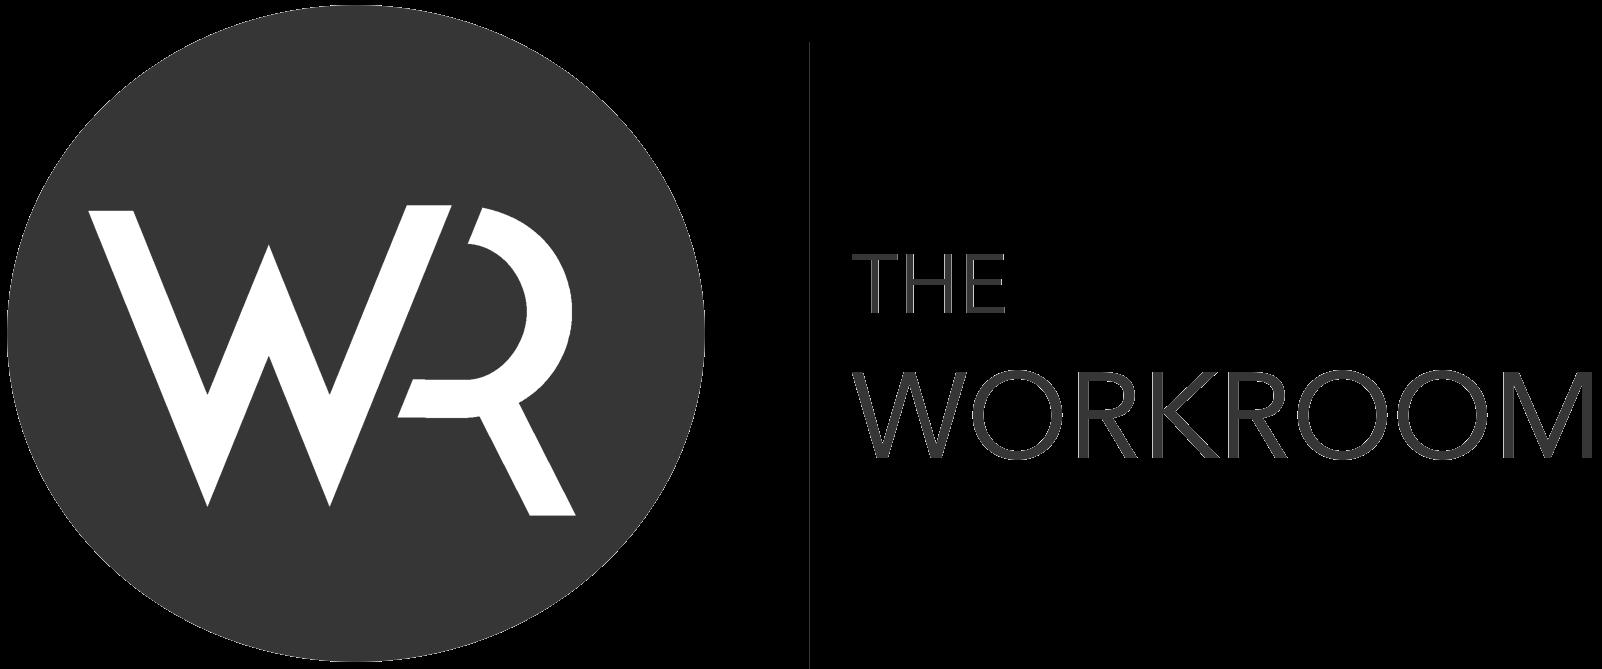 Thw Workroom logo